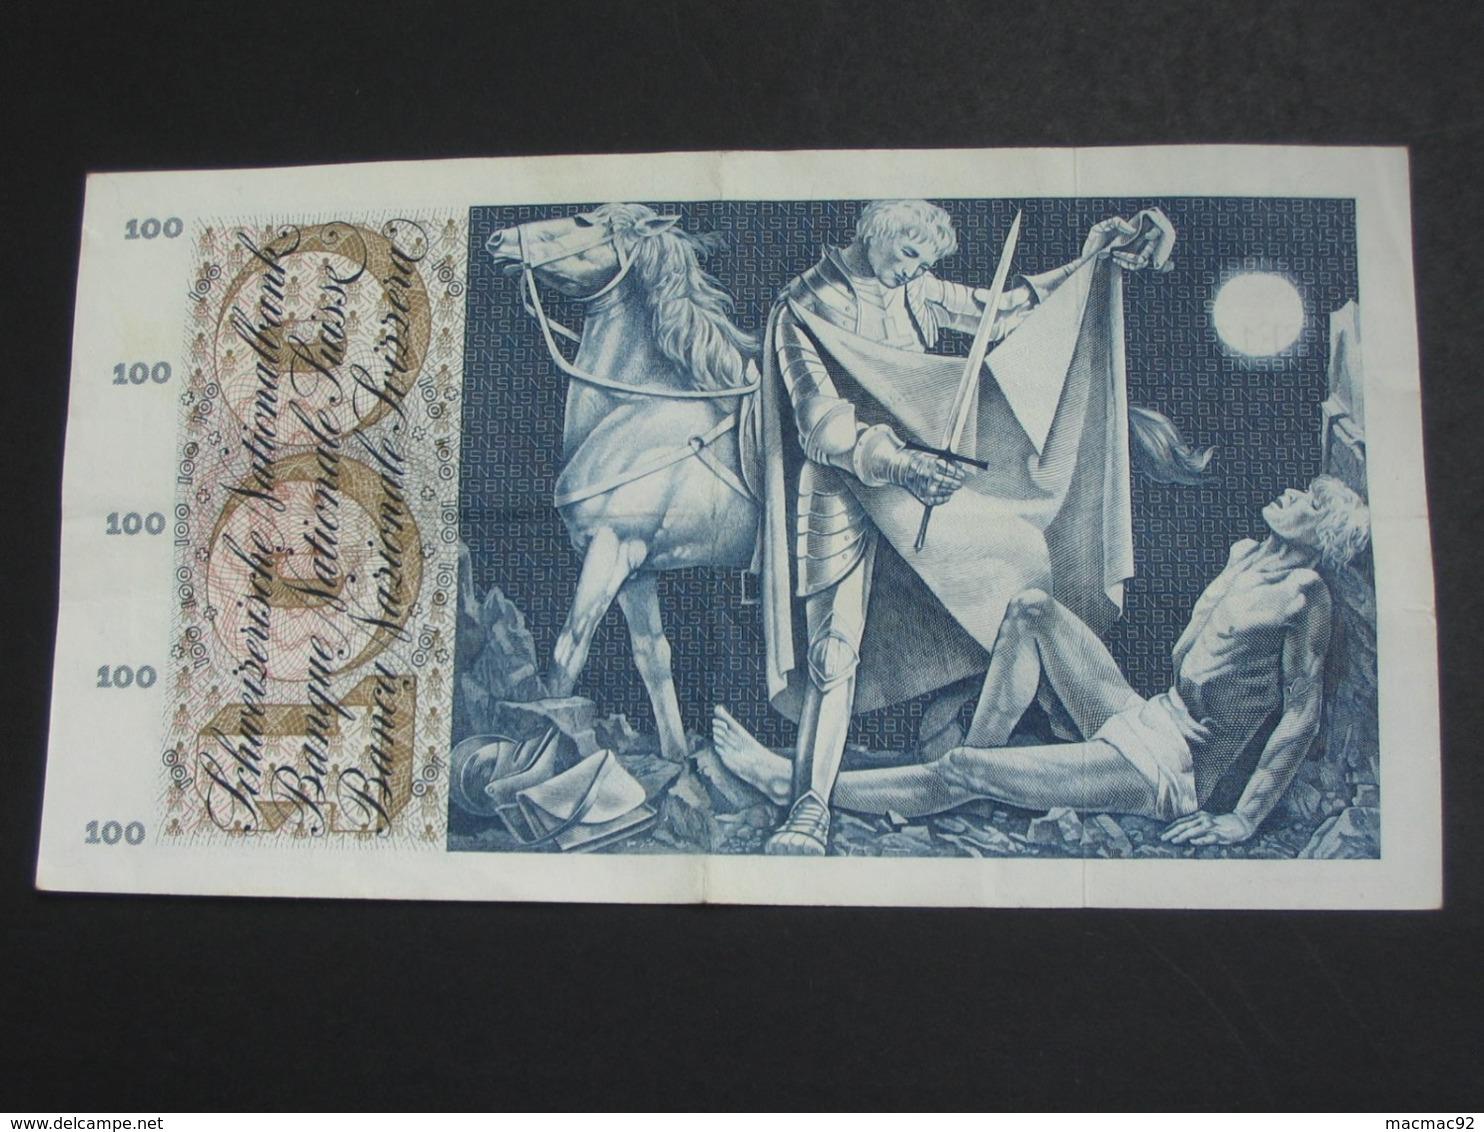 100 Francs SUISSE 2 Avril 1964 - Banque Nationale Suisse - Schweizerische Nationalbank  **** EN ACHAT IMMEDIAT **** - Switzerland